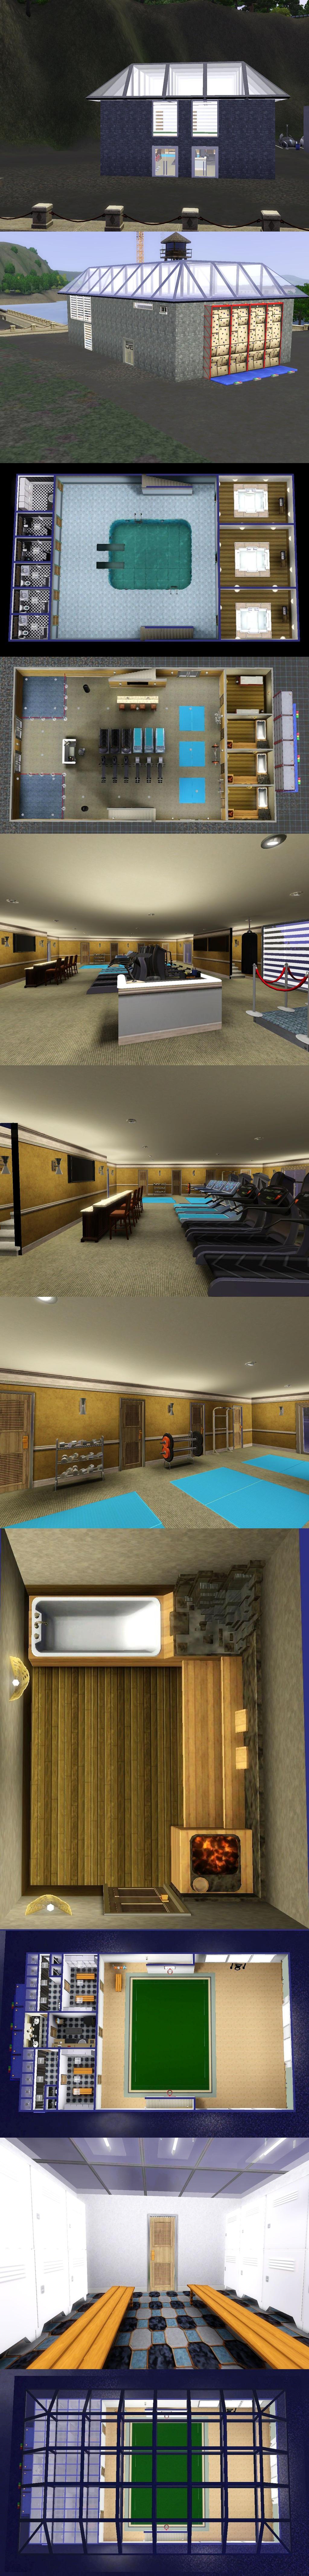 DESMC: Dockside Gym by PrlUnicorn